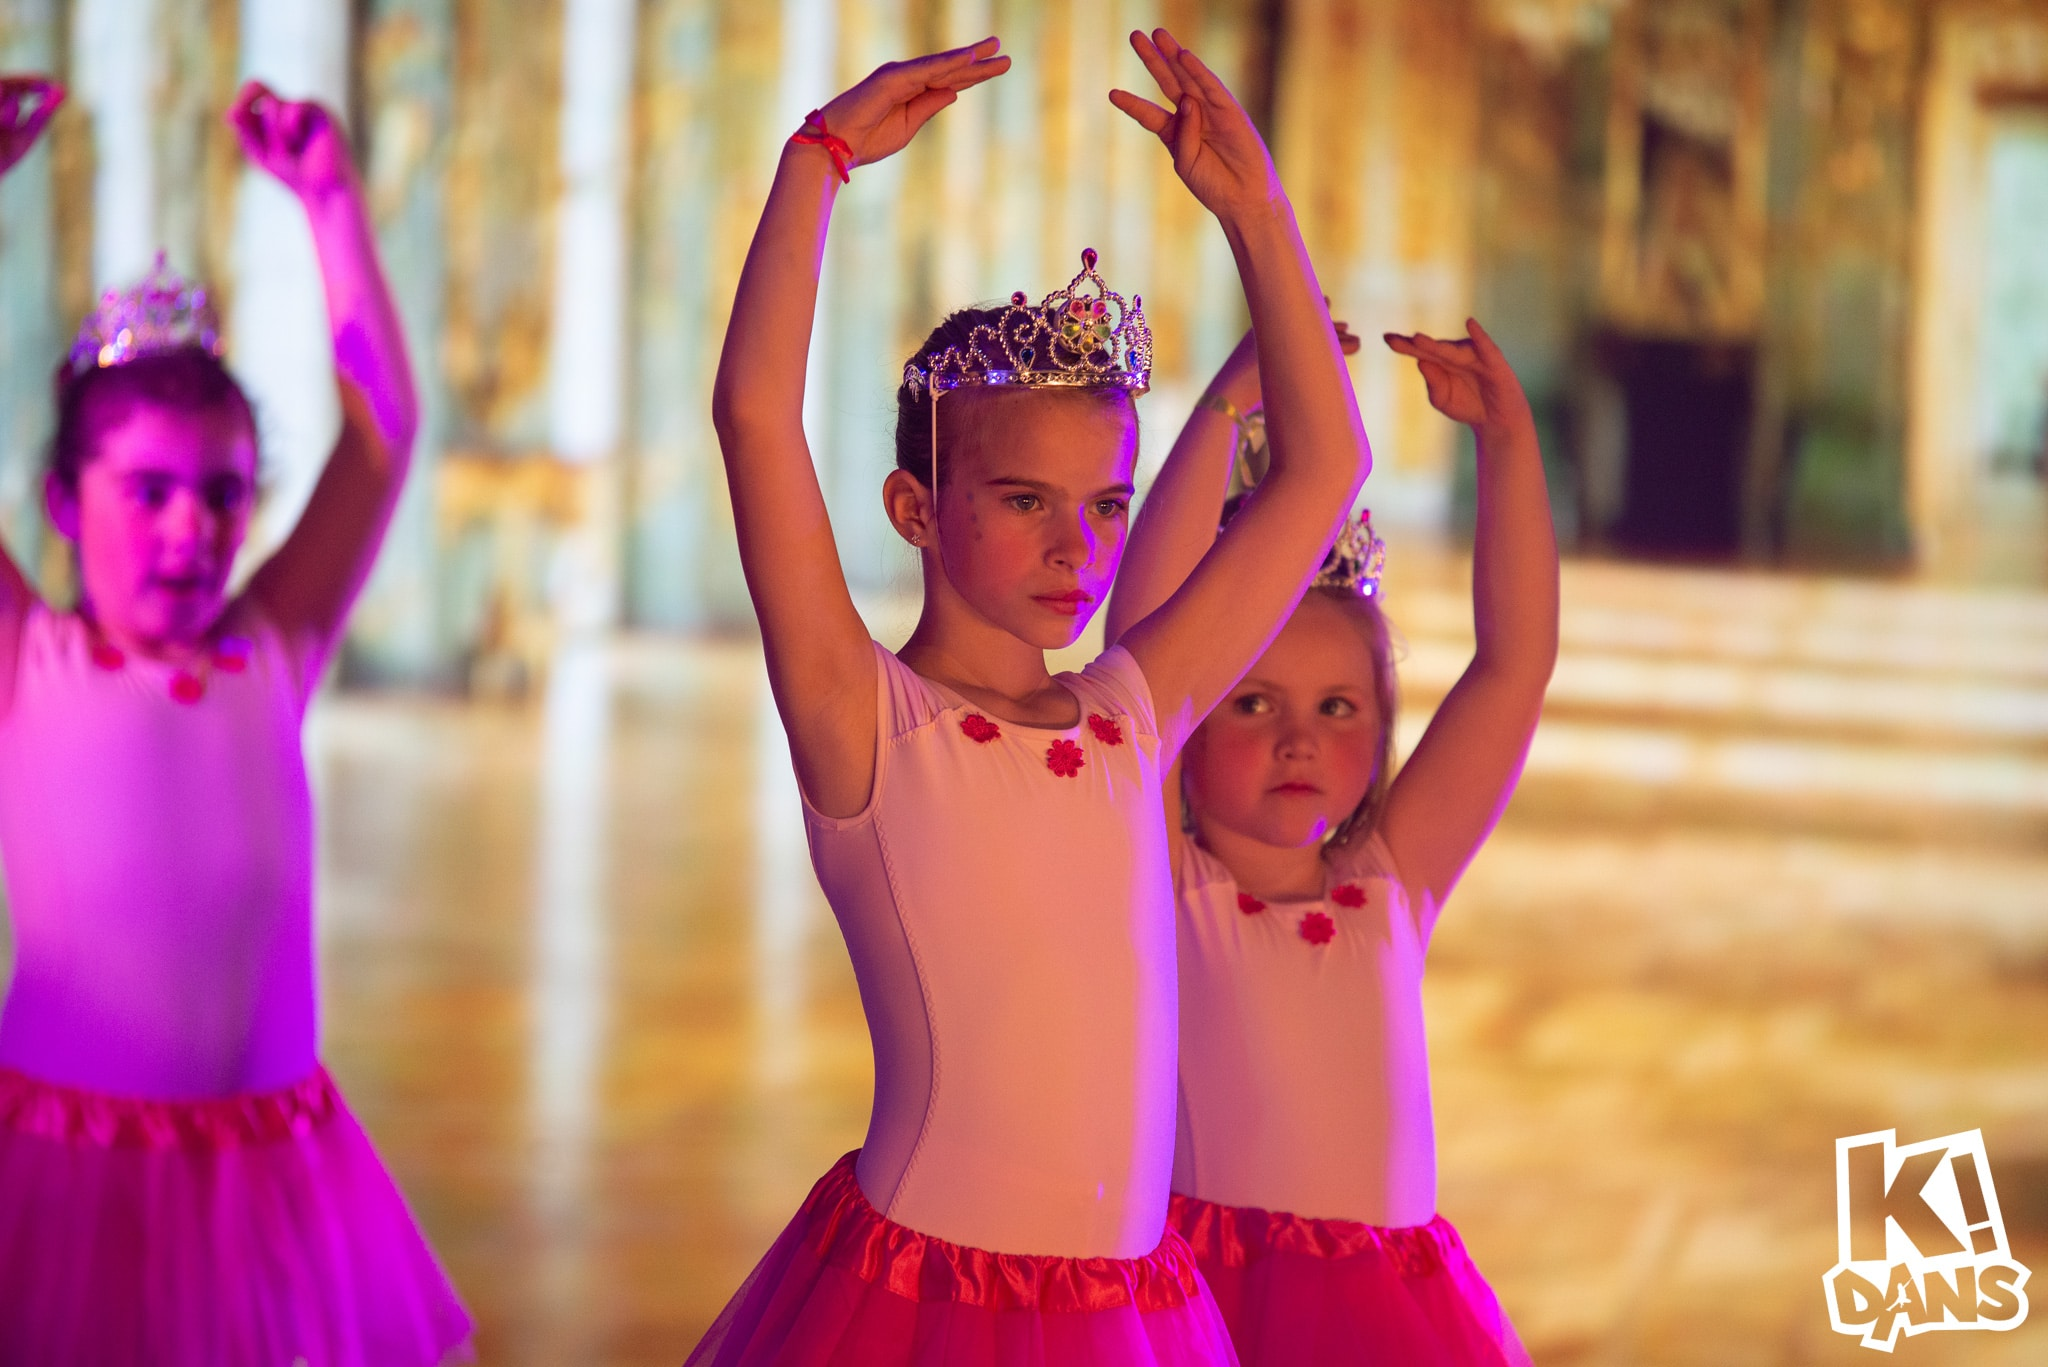 Dansschool Mechelen K Dans